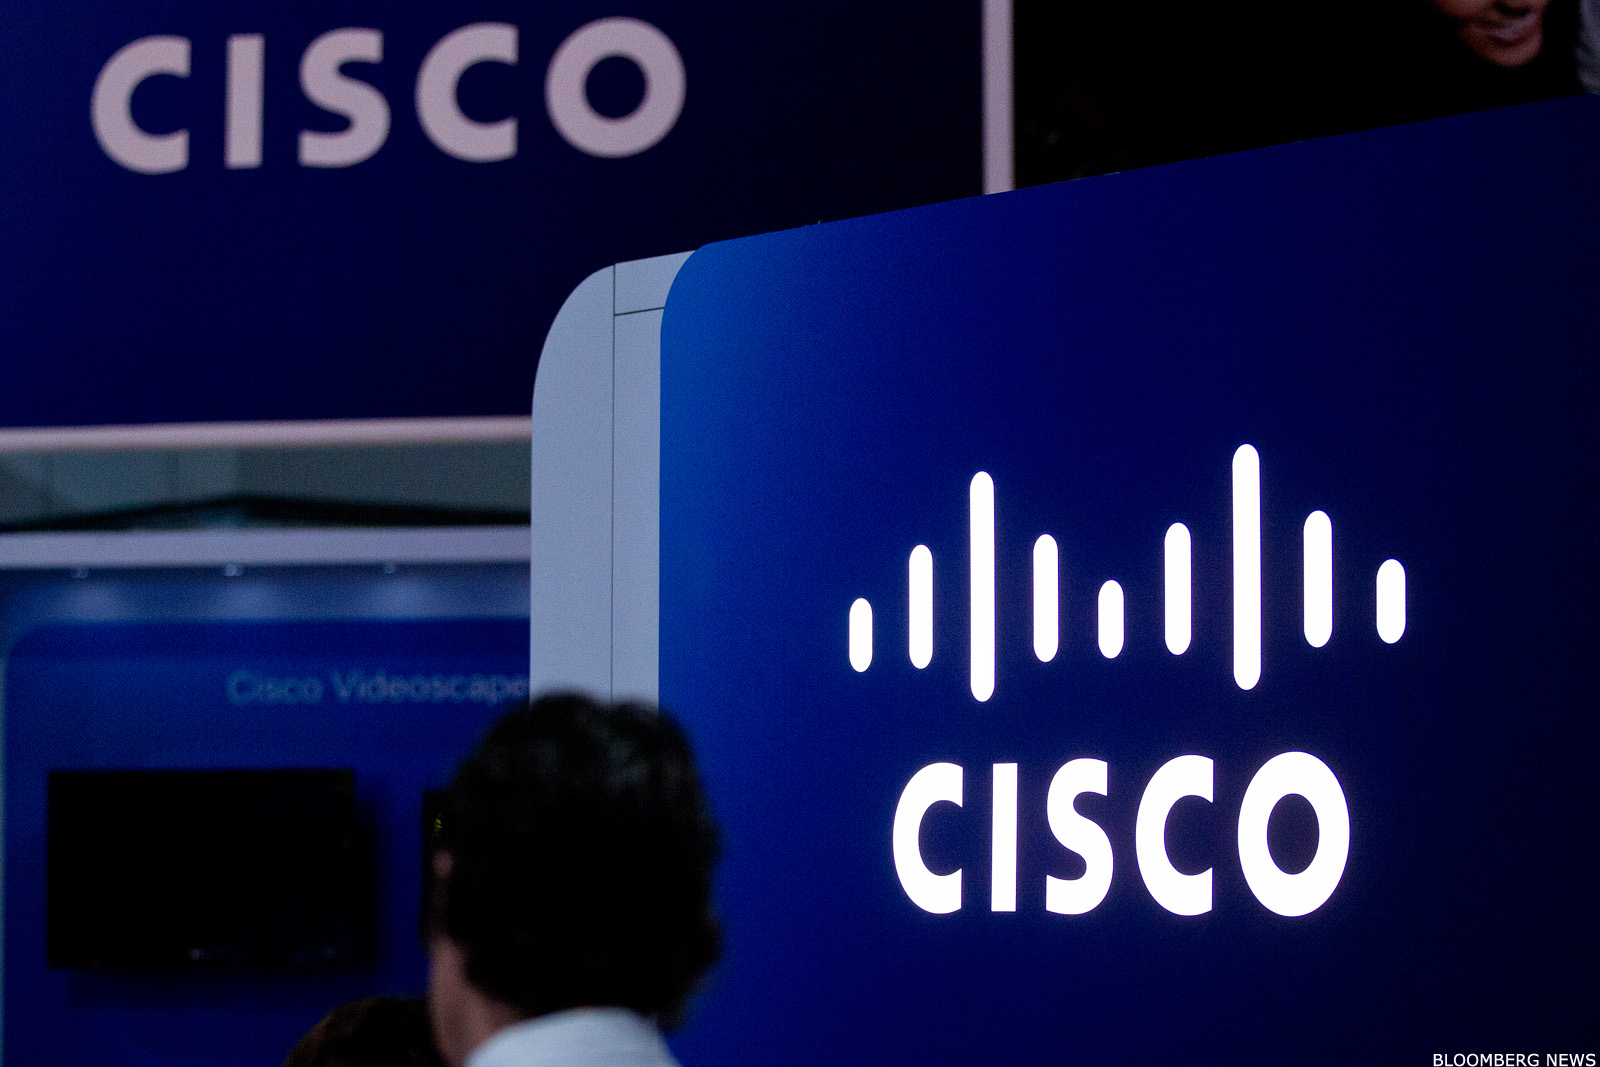 Cisco Csco Stock Higher On Cloudlock Acquisition Thestreet